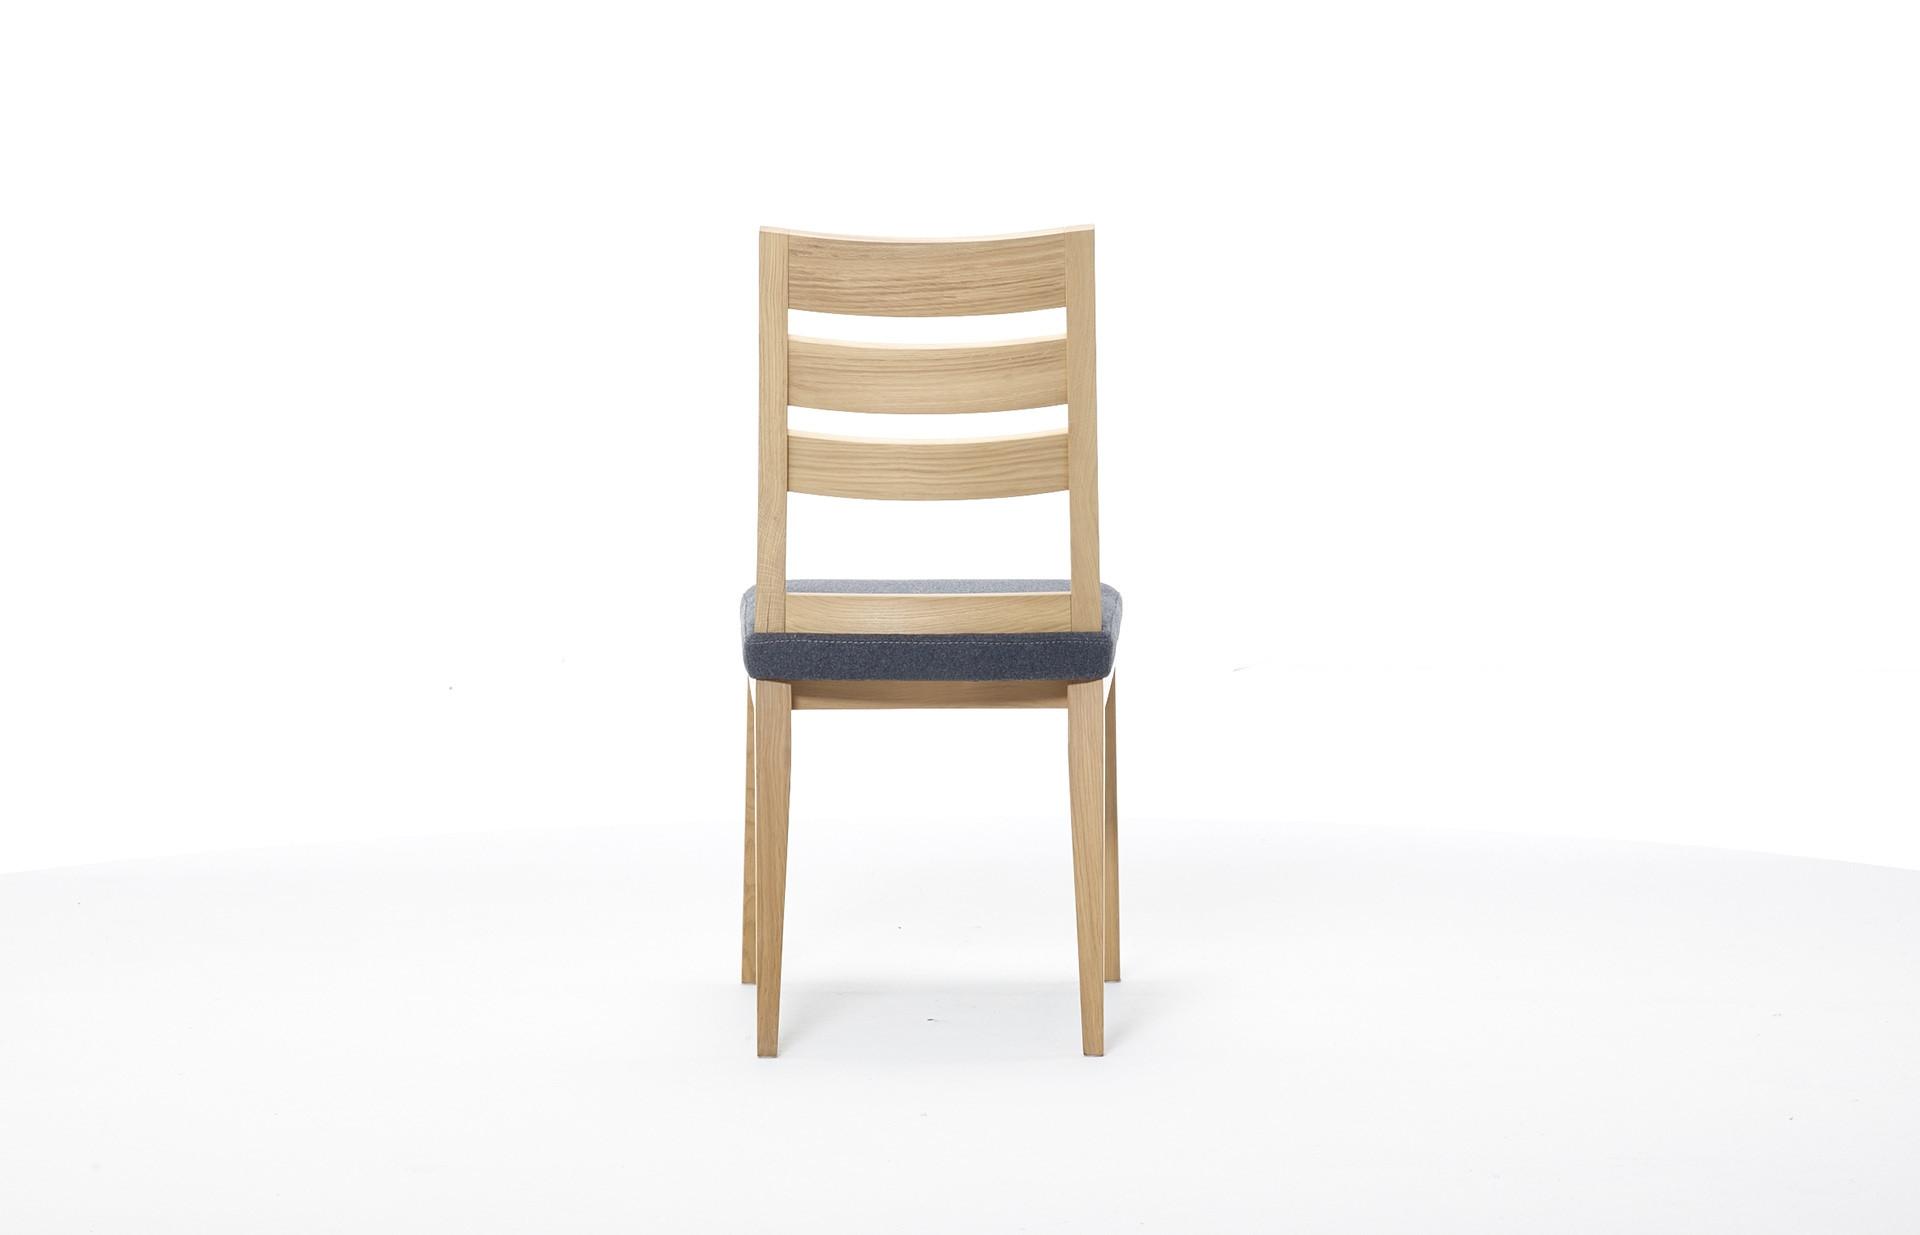 Stuhl Femke in Eiche bianco geölt, Bezugstoff Wollfilz in Mittelgrau